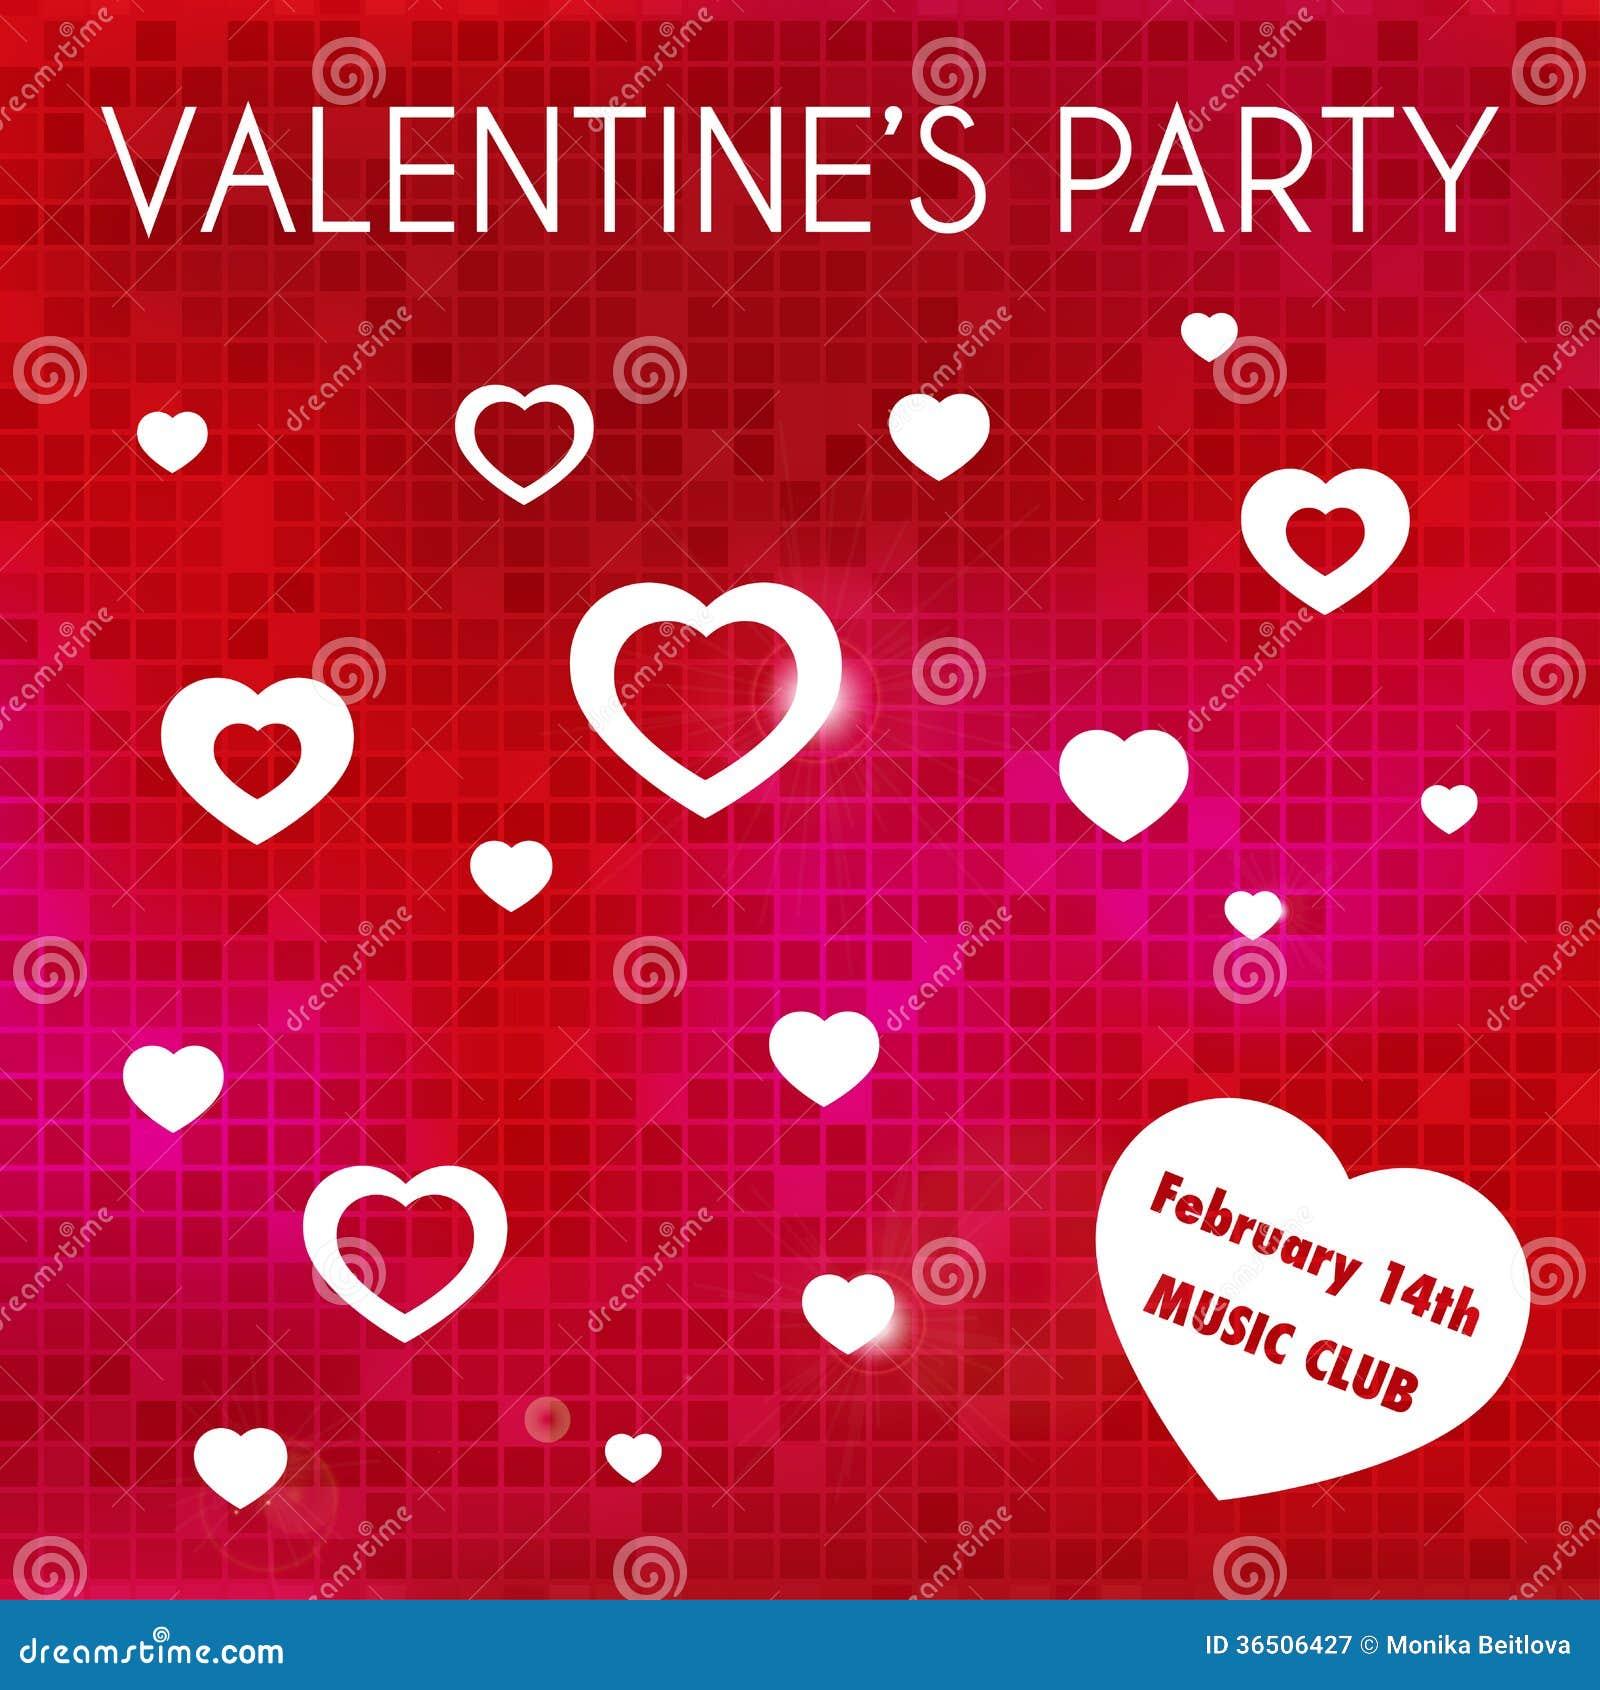 Invitation de la partie de Valentine